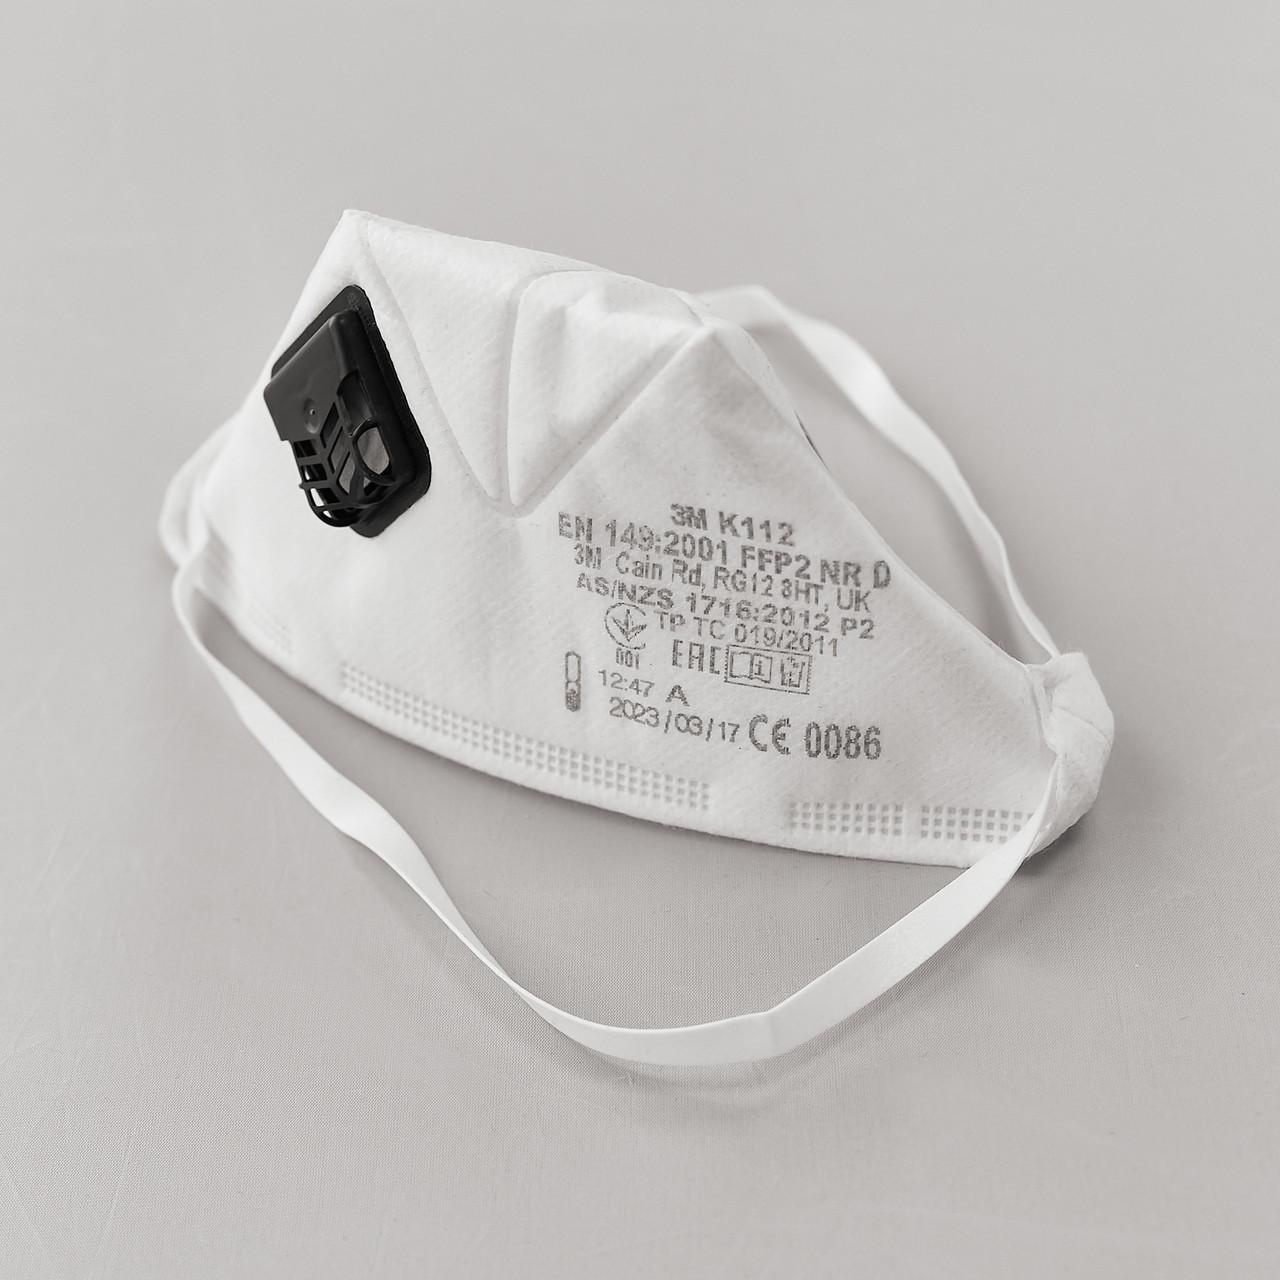 Респіратор маска 3M FFP2 c клапаном білий (захист класу ФФП2 k112)